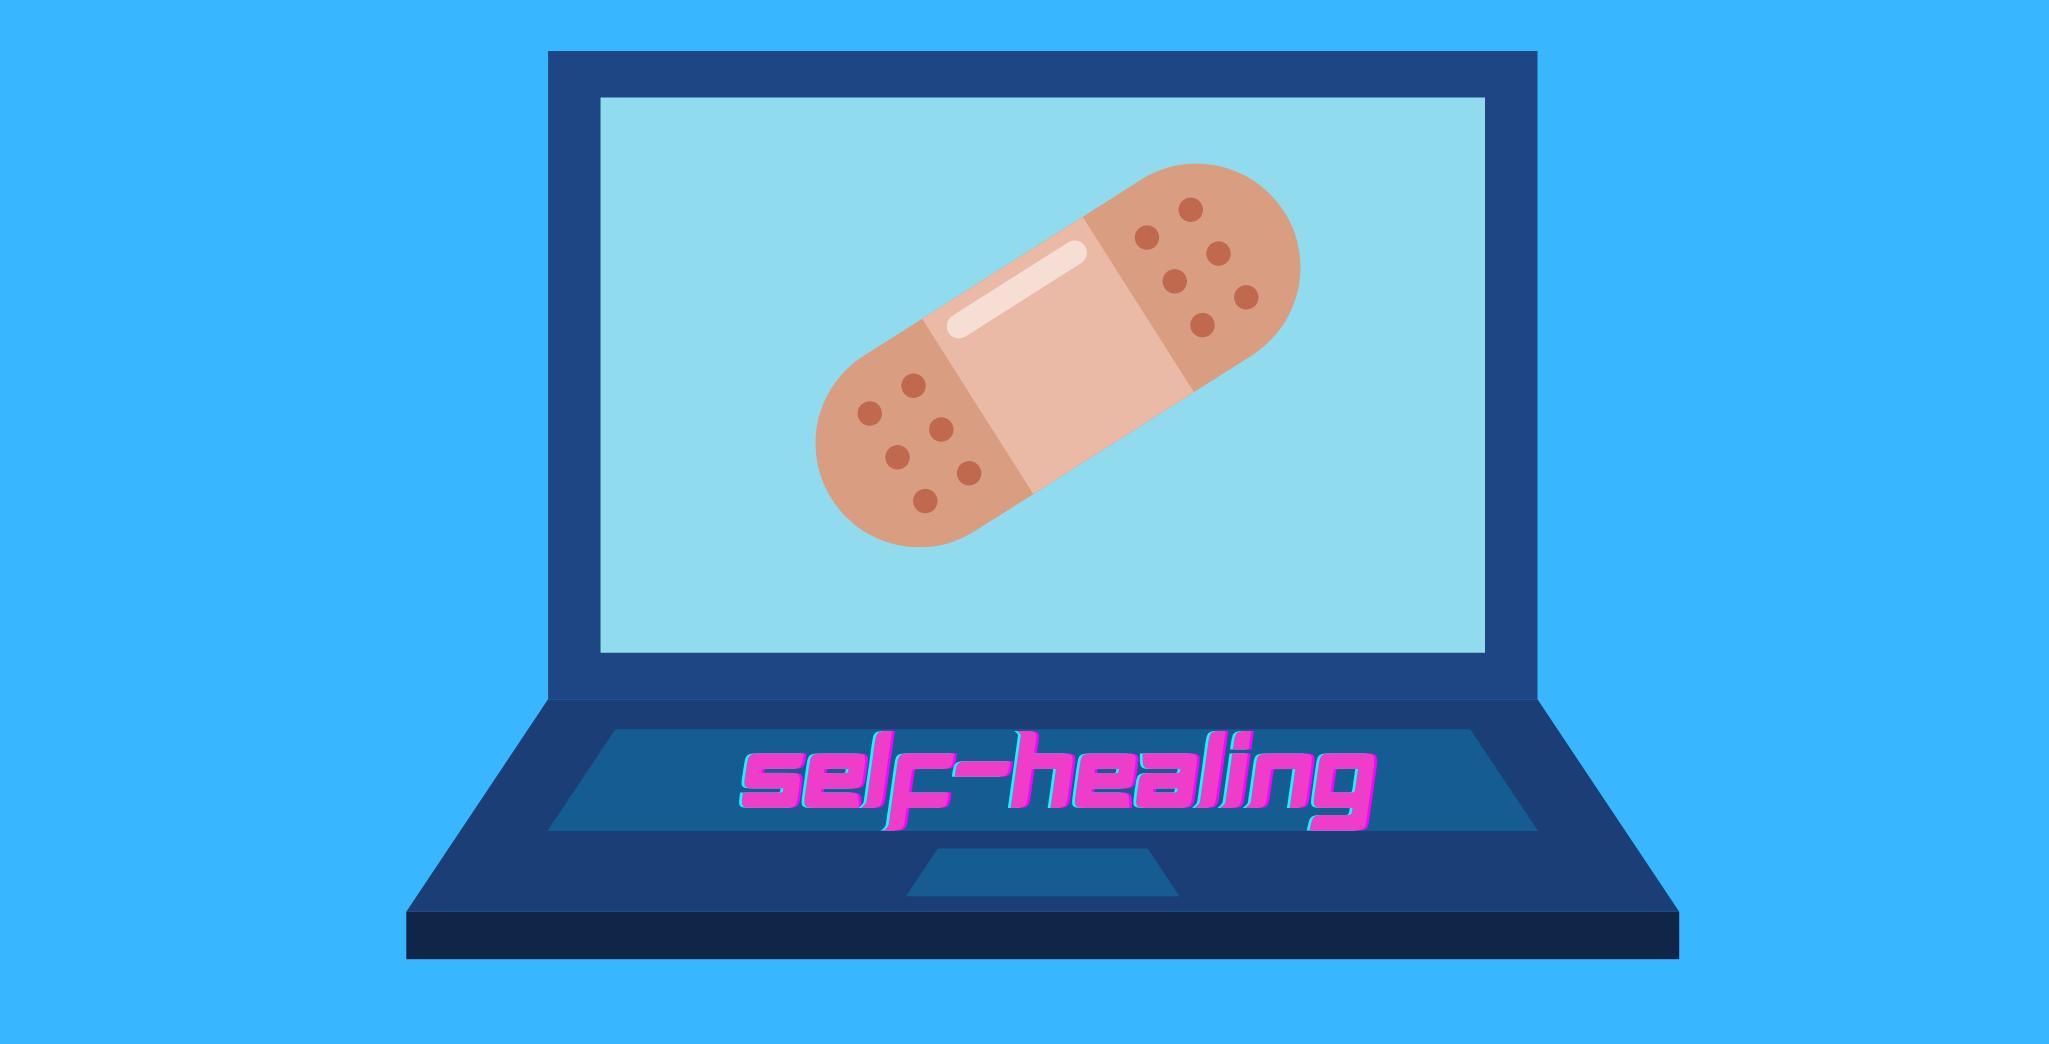 Self-healing Definition